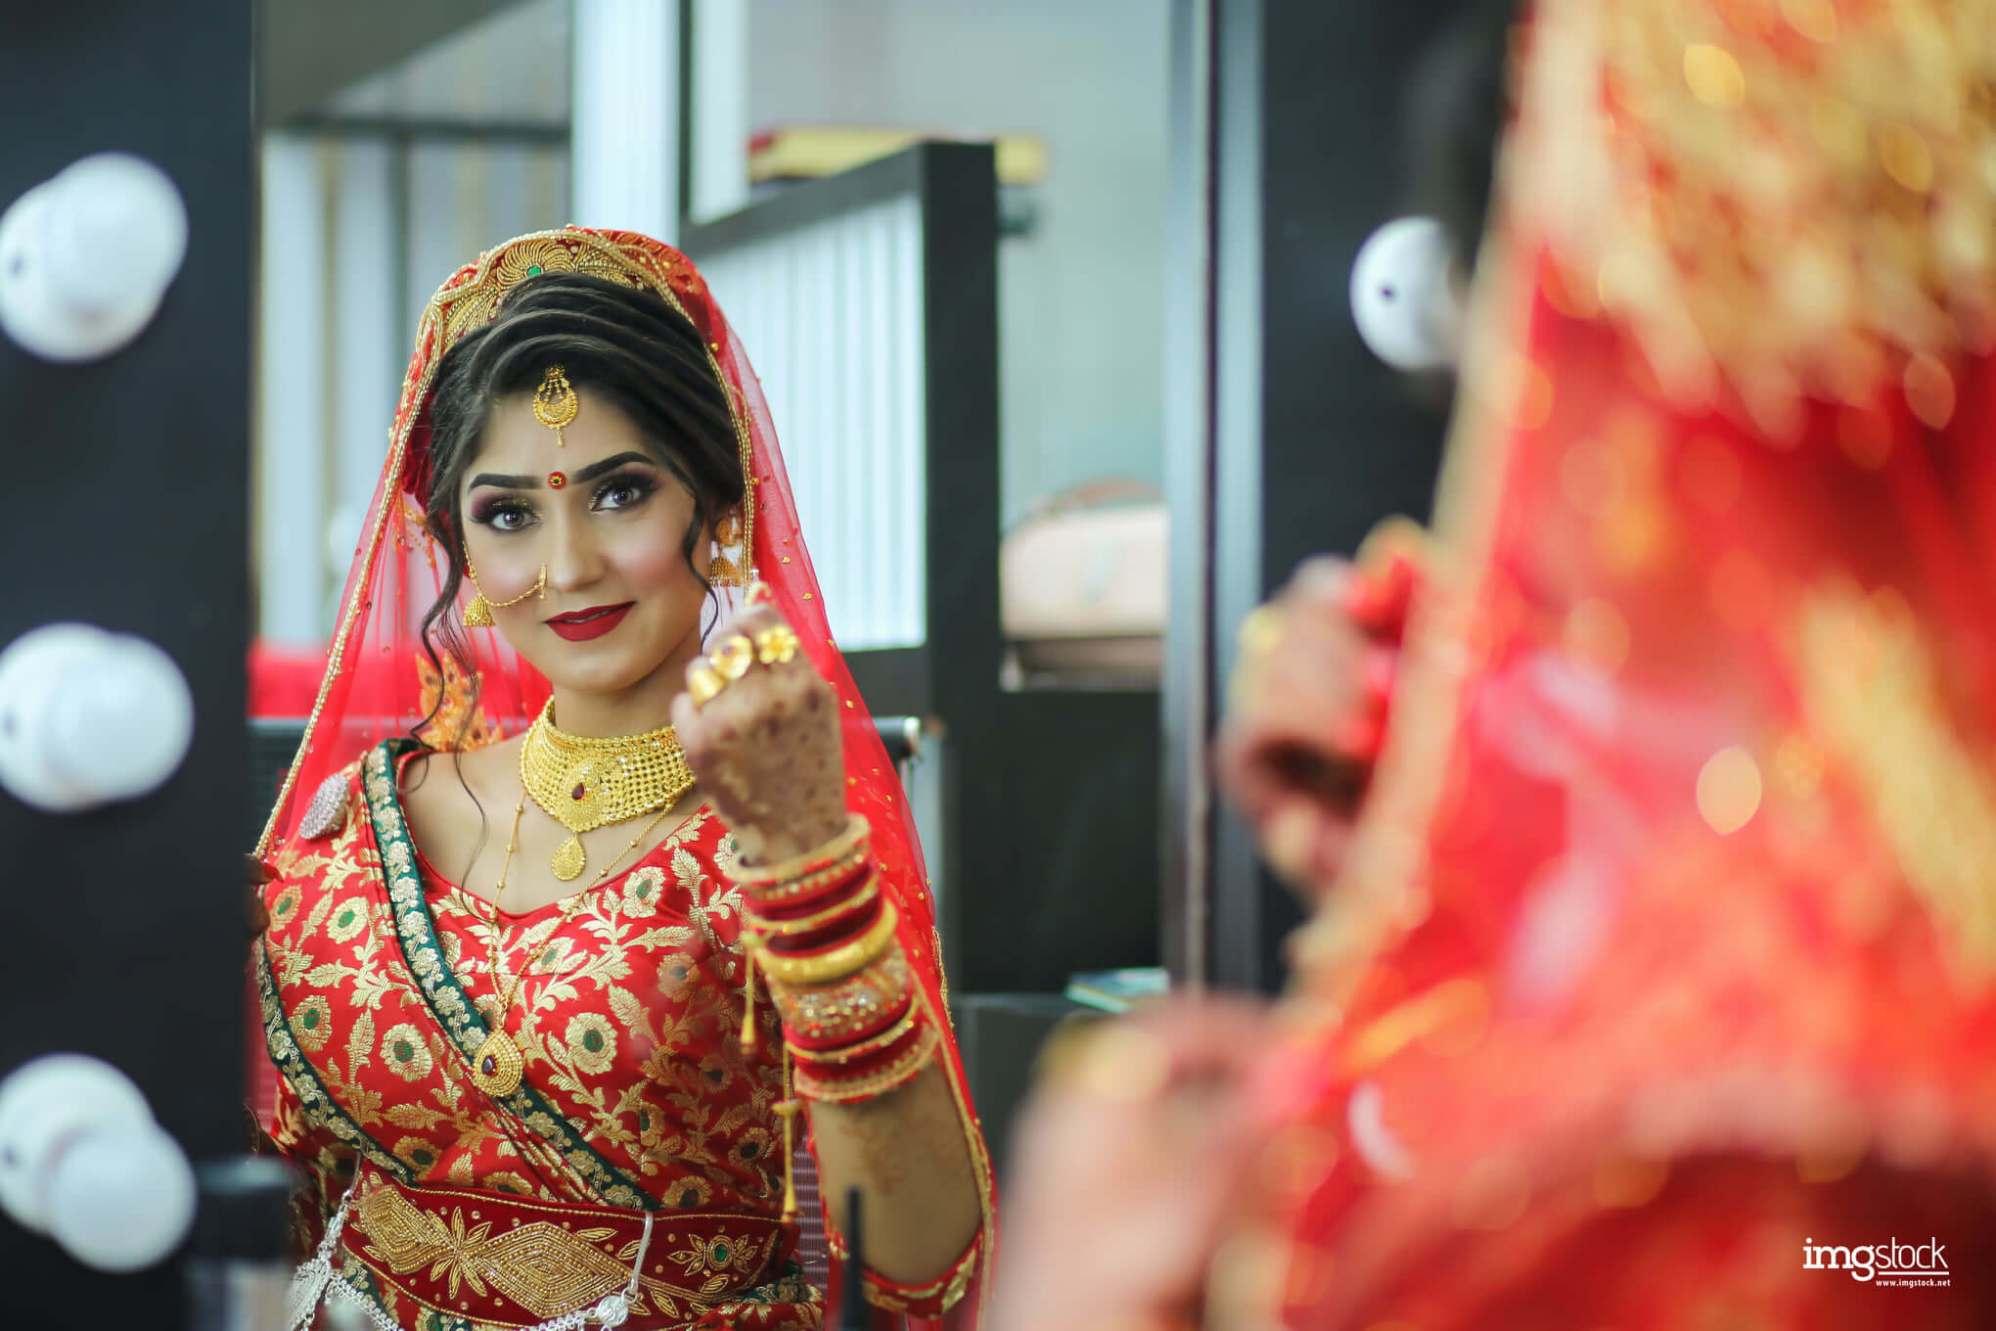 Aayusha Pokharel - Bridal photography - ImgStock, Biratnagar